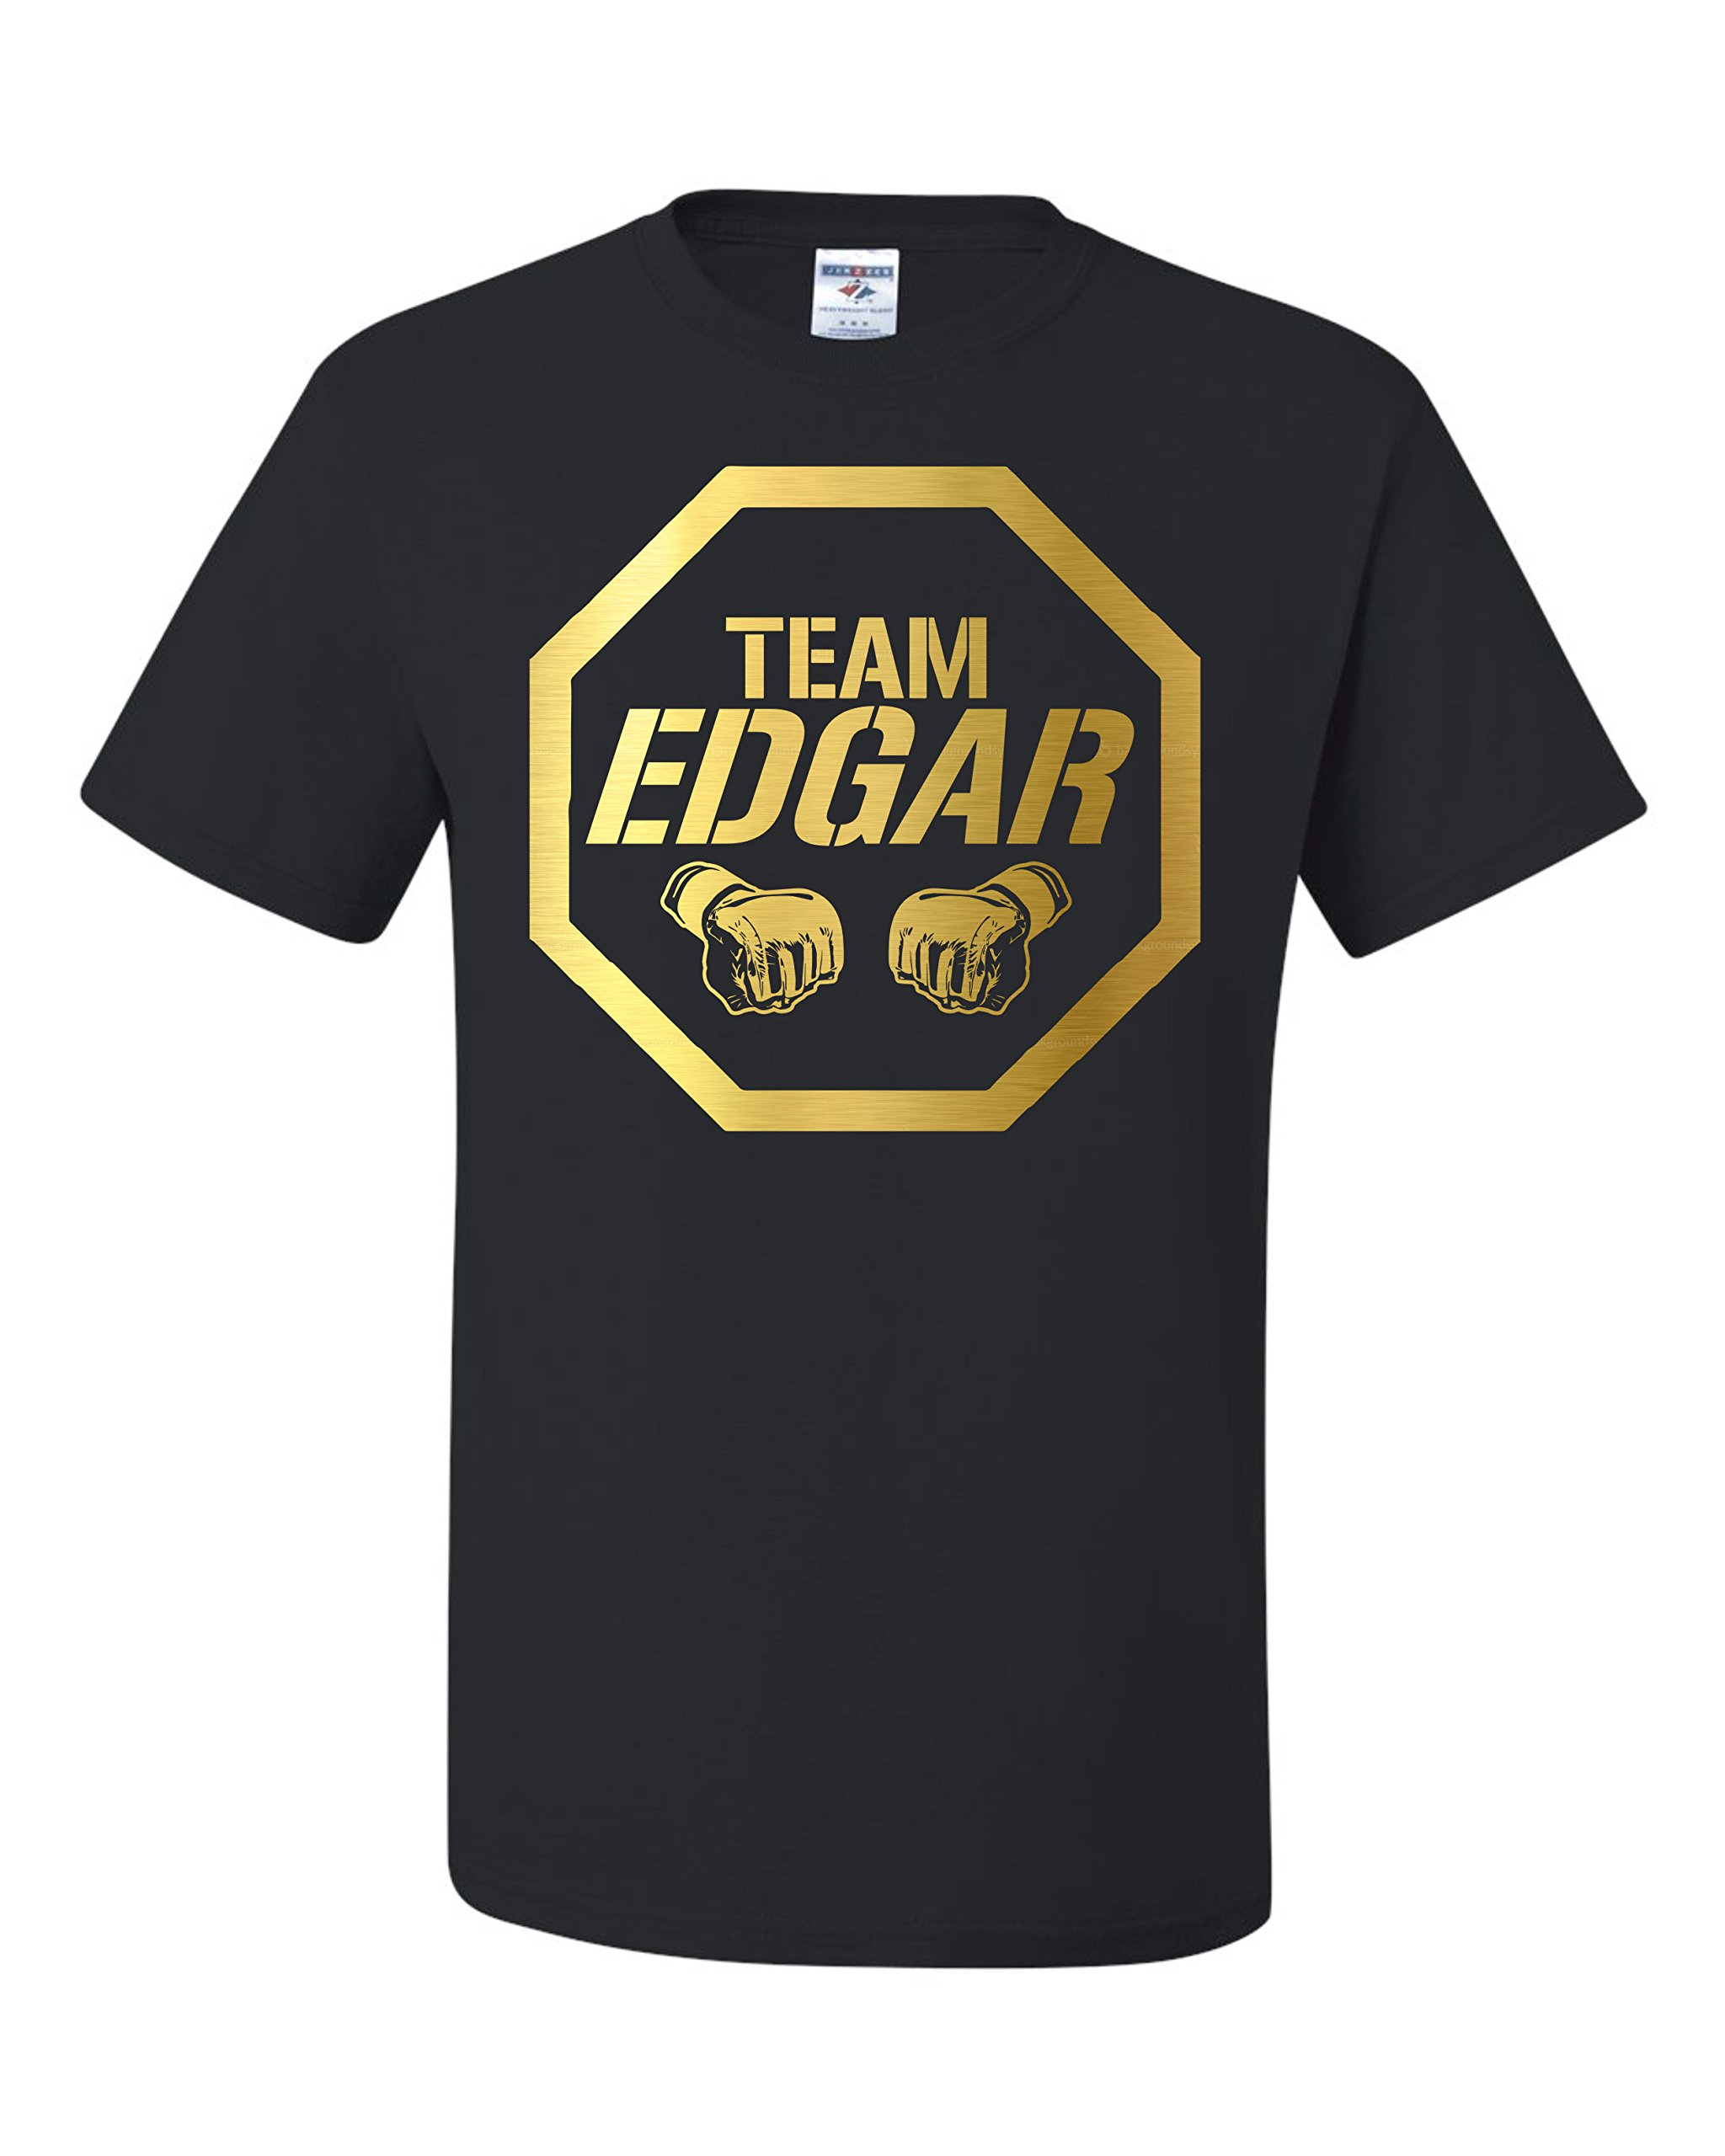 Team Edgar Mma Fighting Frankie Edgar Unisex T Shirt